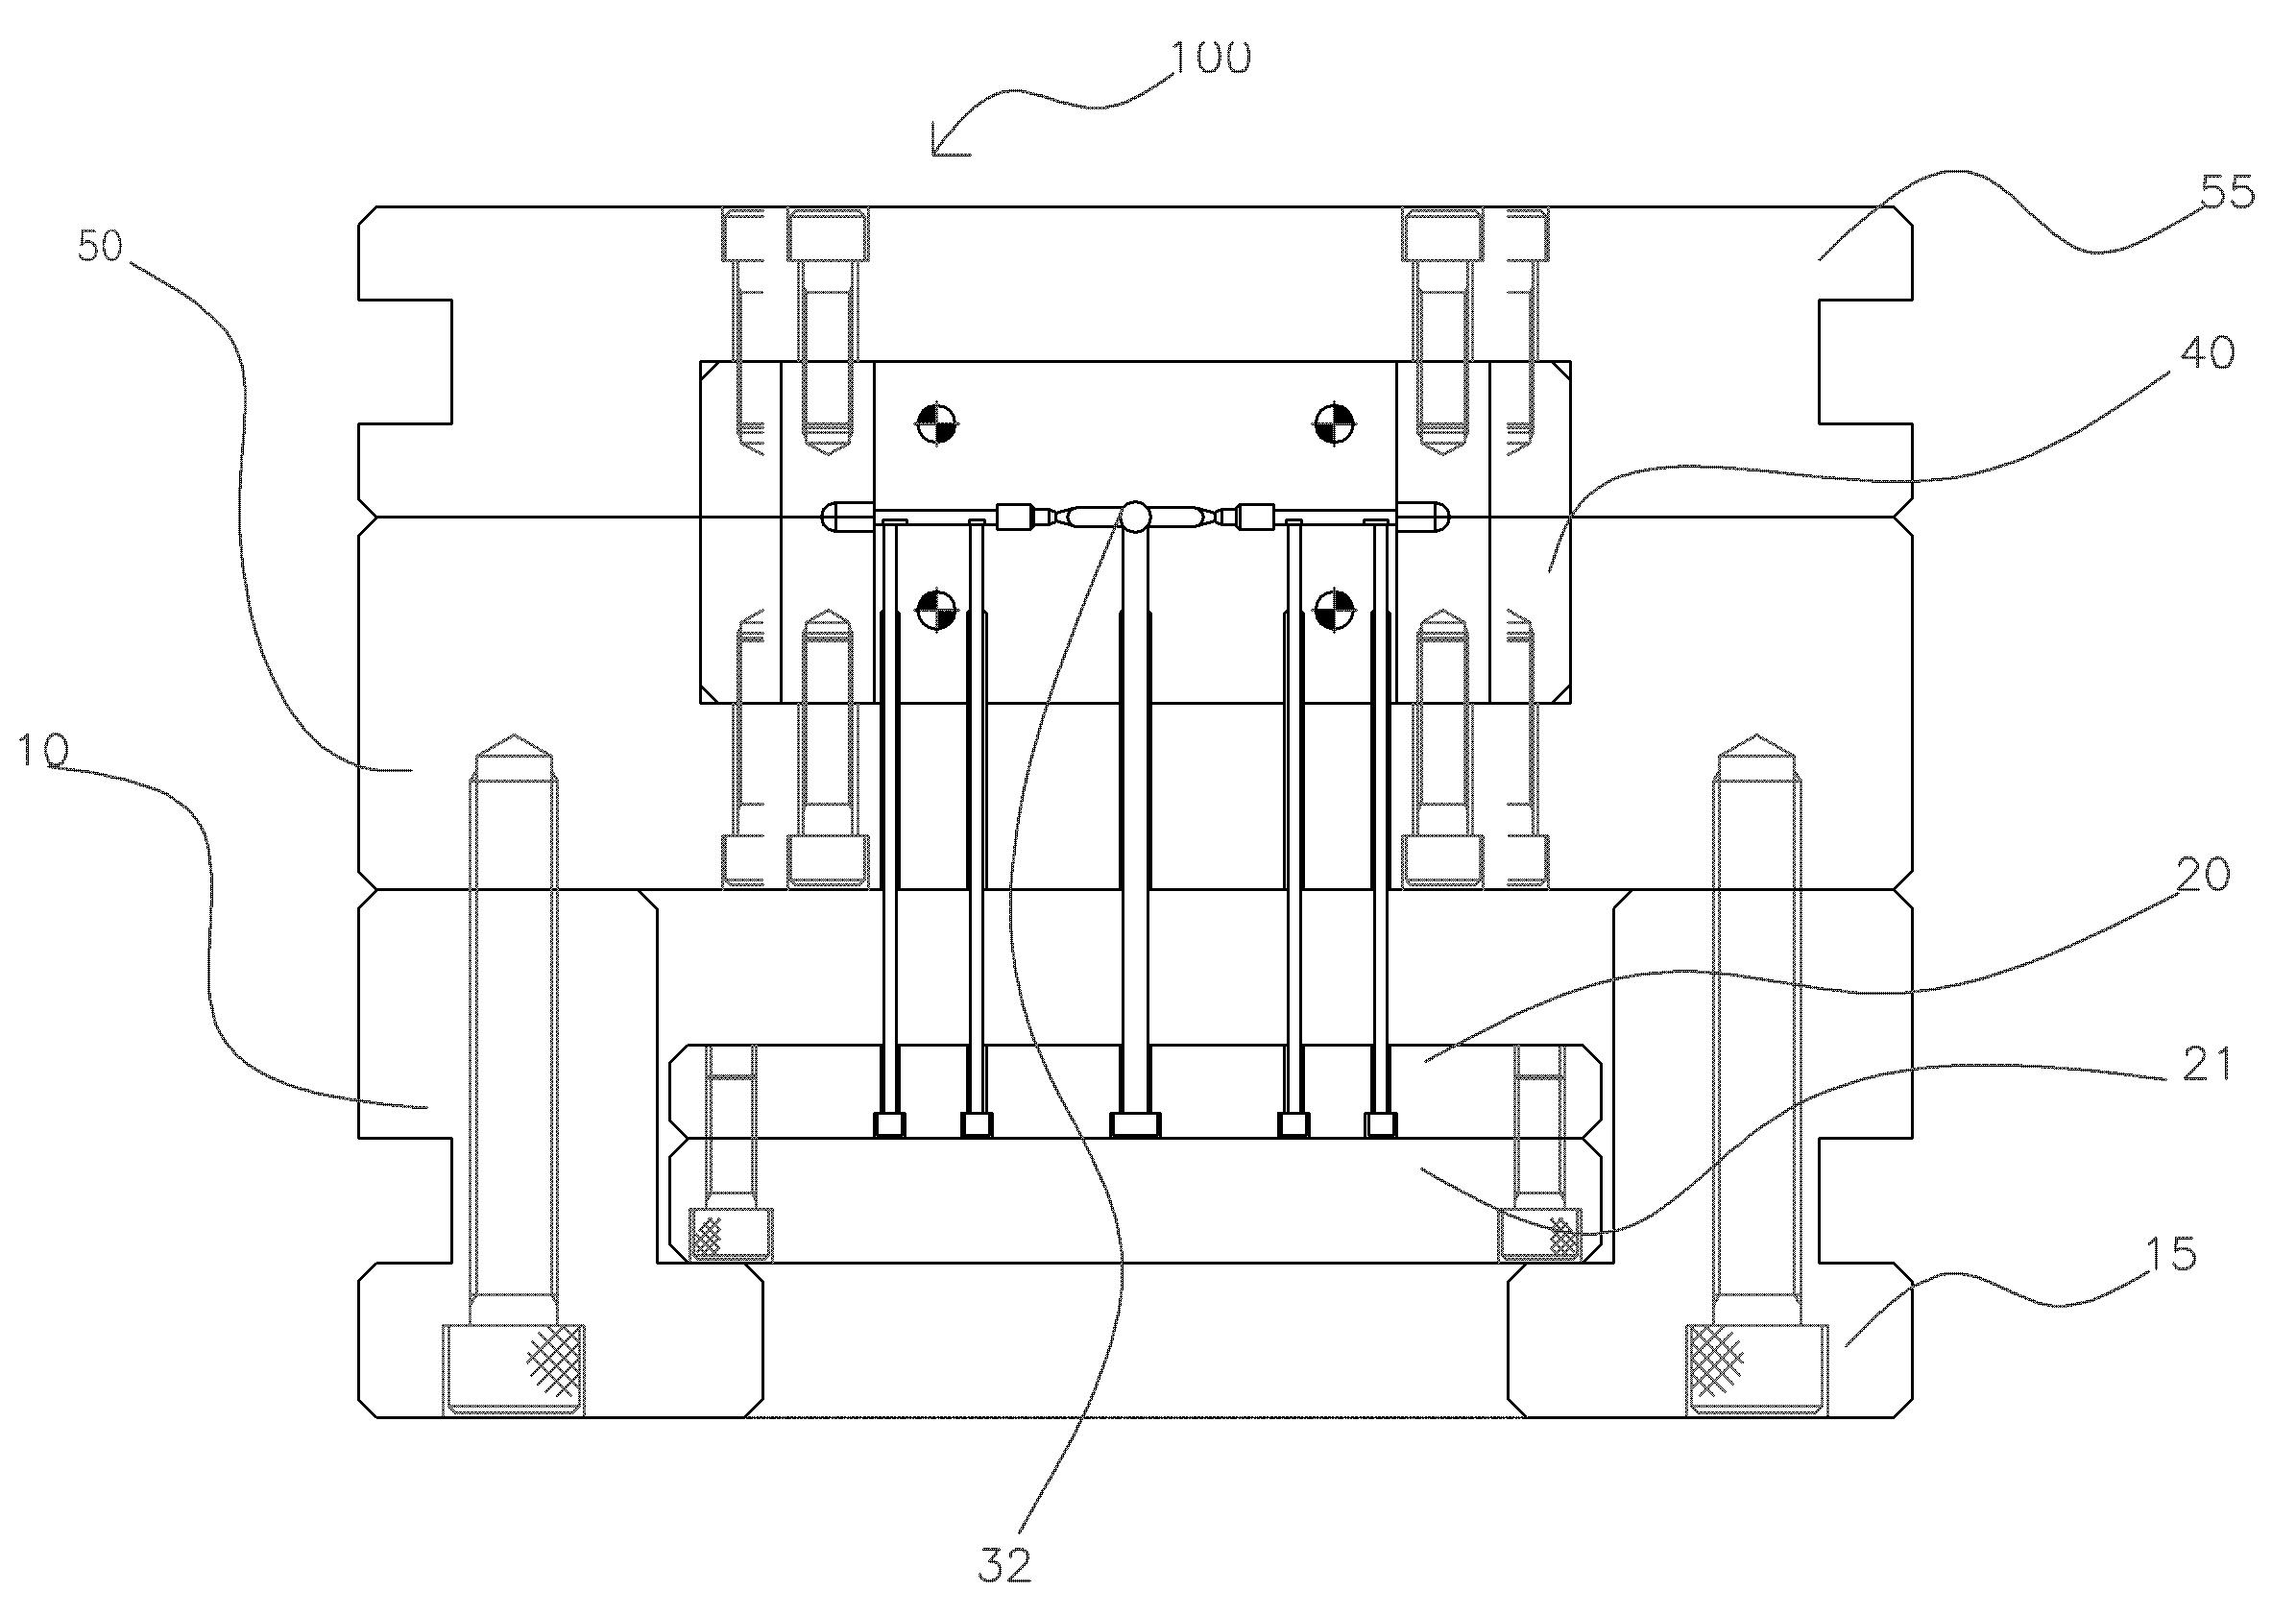 patent wo2011102678a2